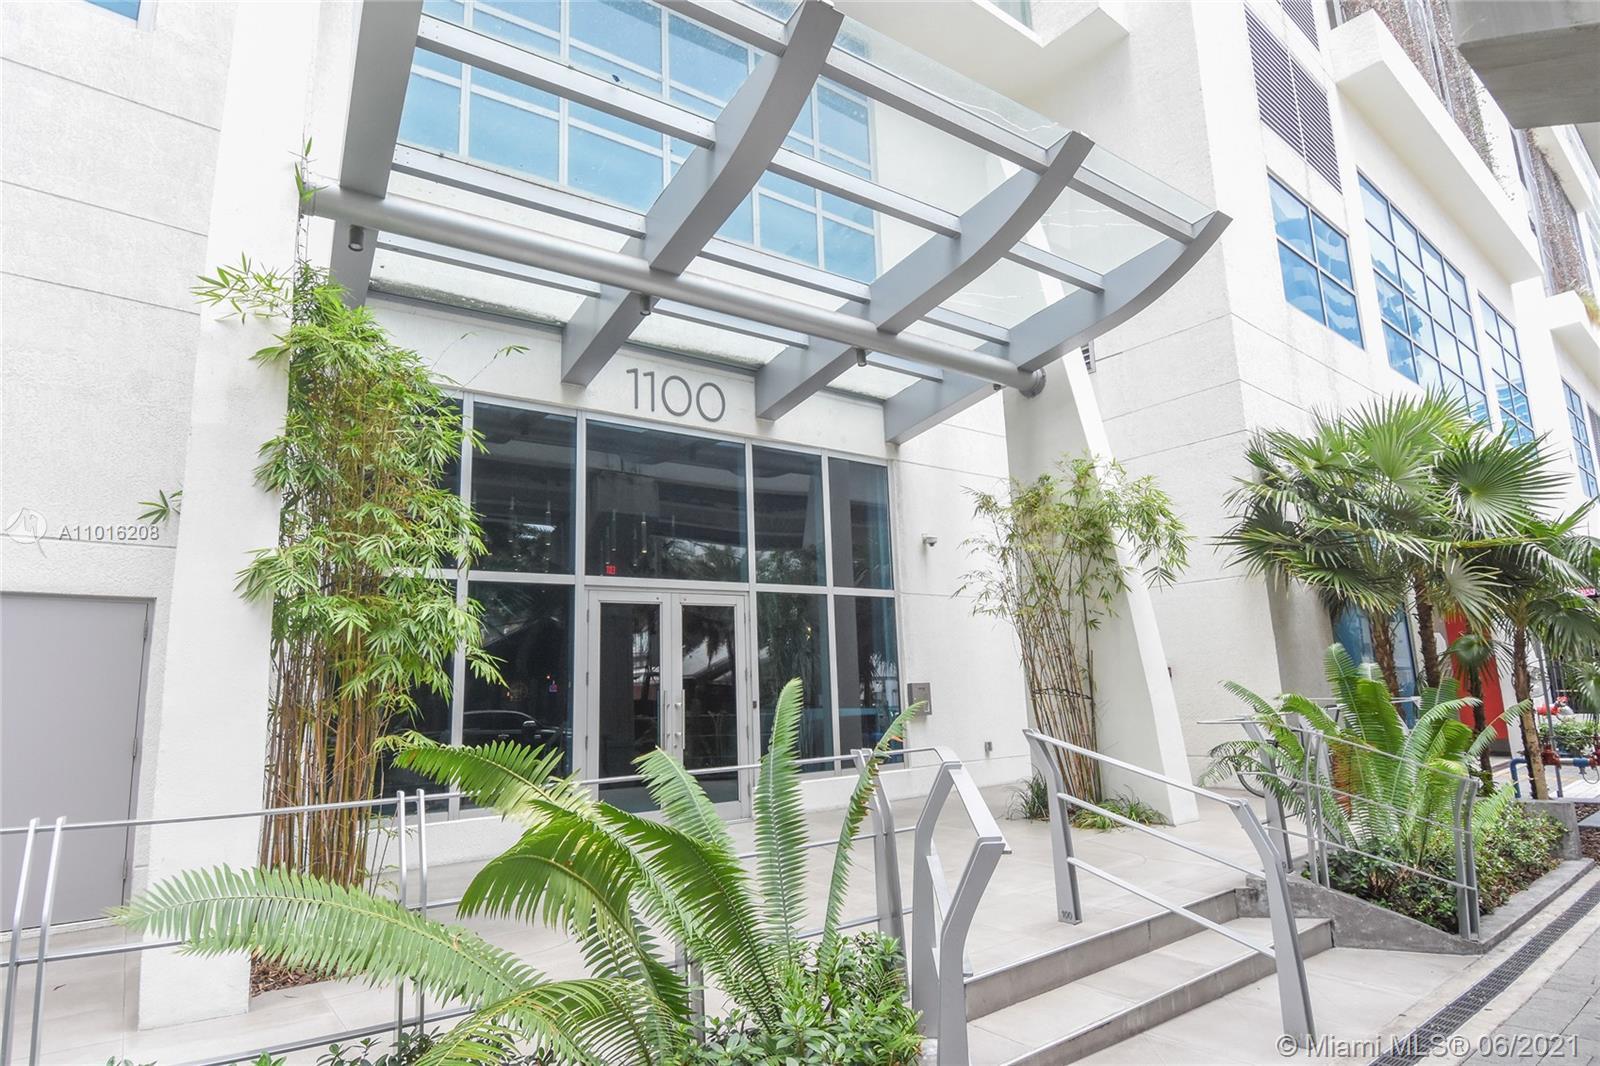 1100 Millecento #2510 - 1100 S Miami Ave #2510, Miami, FL 33130